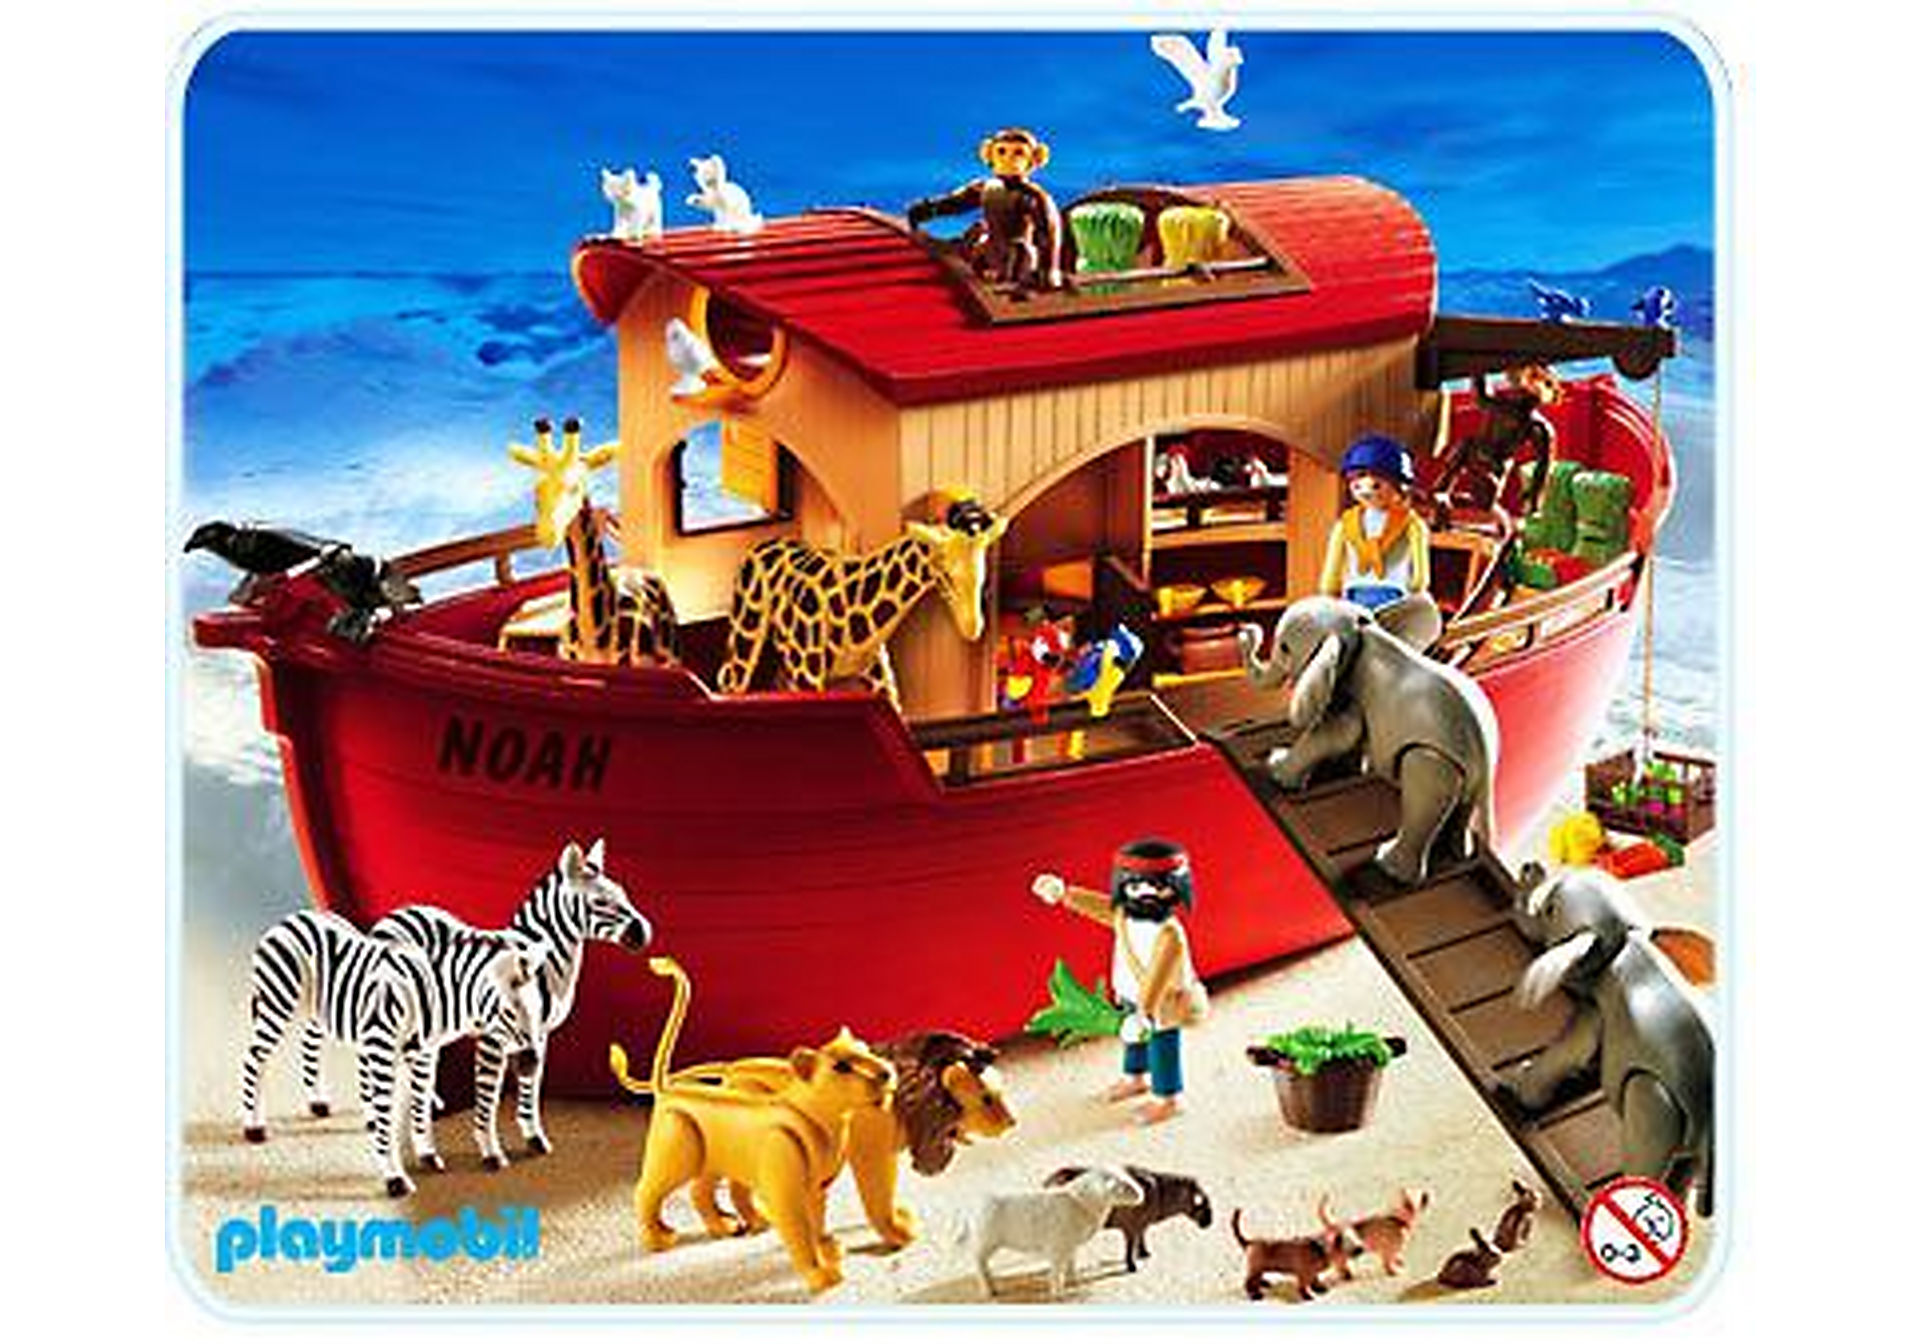 http://media.playmobil.com/i/playmobil/3255-C_product_detail/Arche de Noé